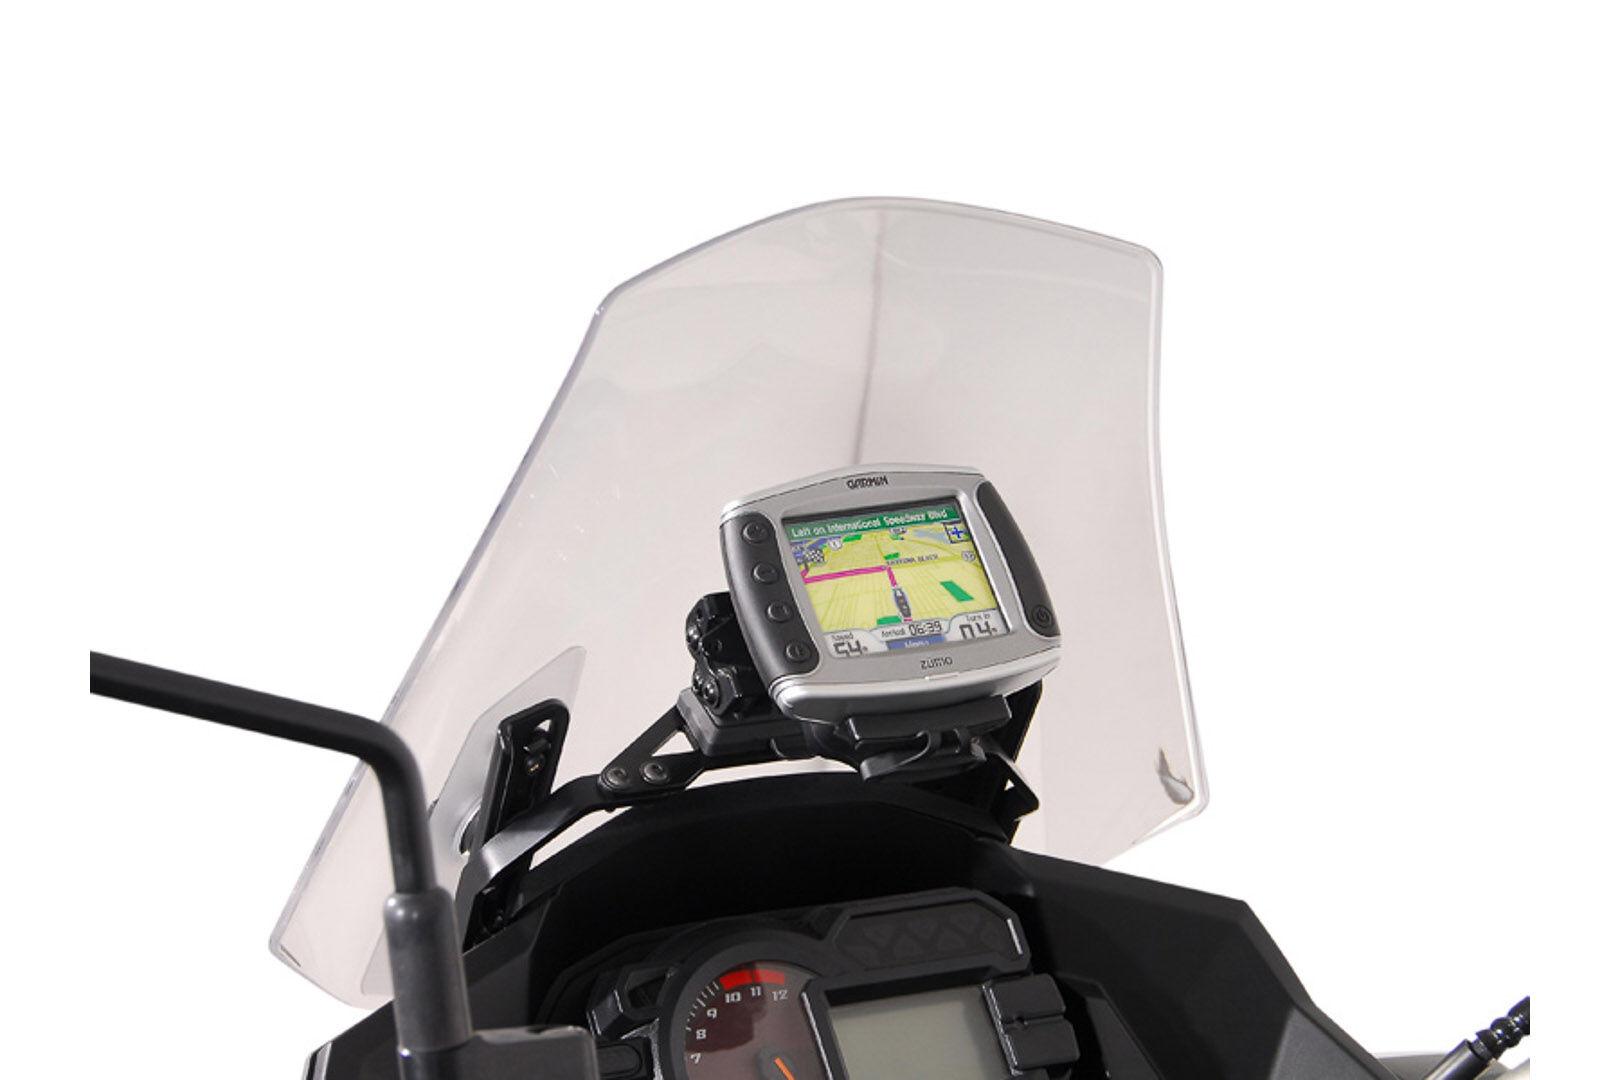 SW-Motech GPS montere for cockpit svart - Kawasaki Versys 1000 (12-...